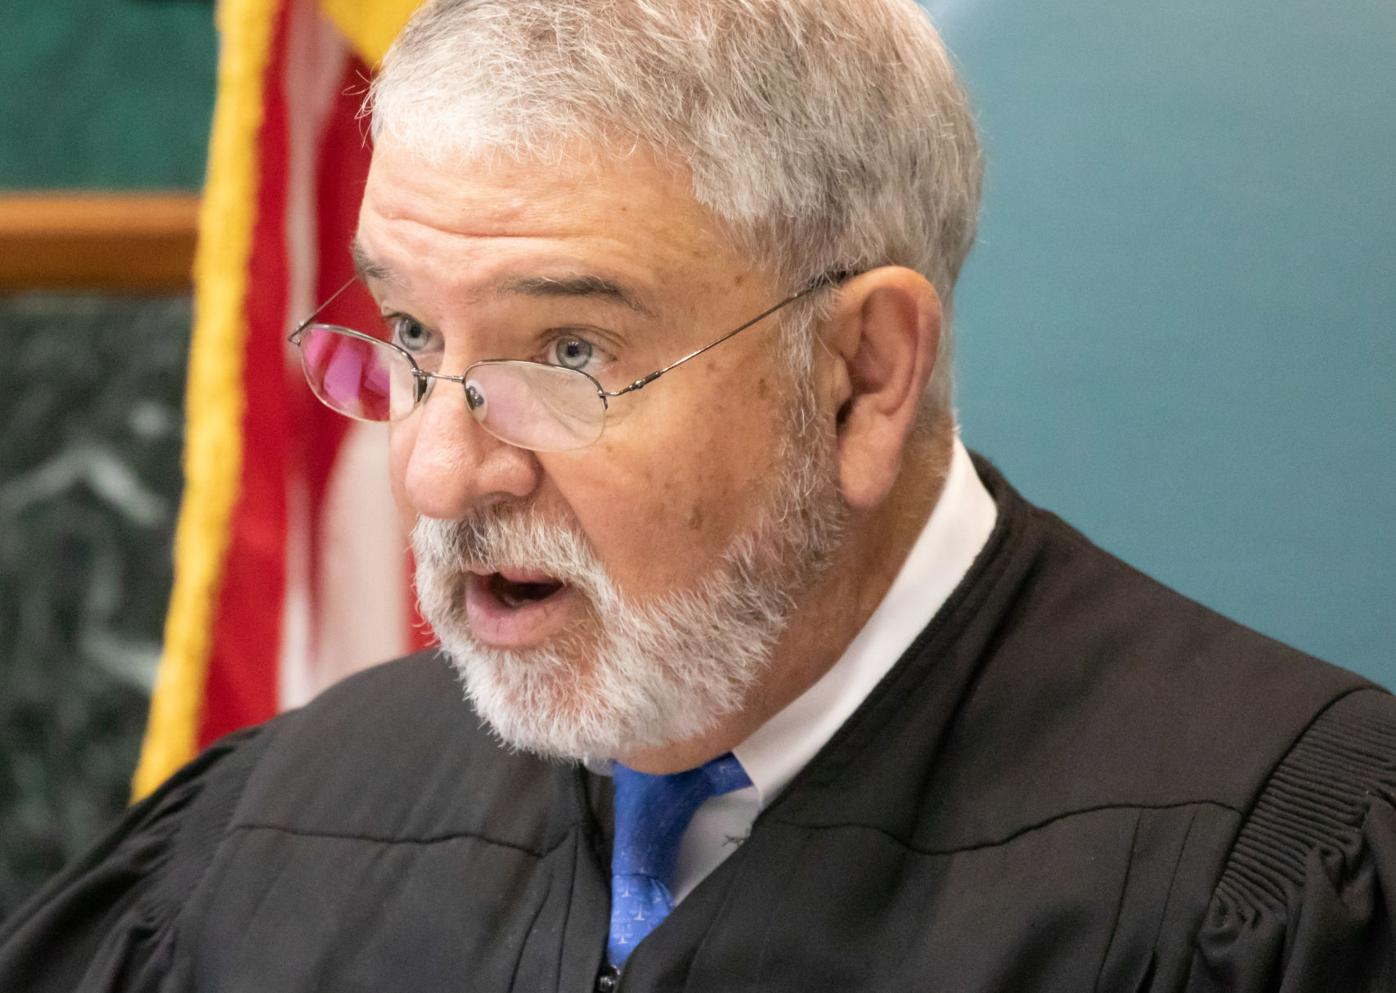 Judge Bedell